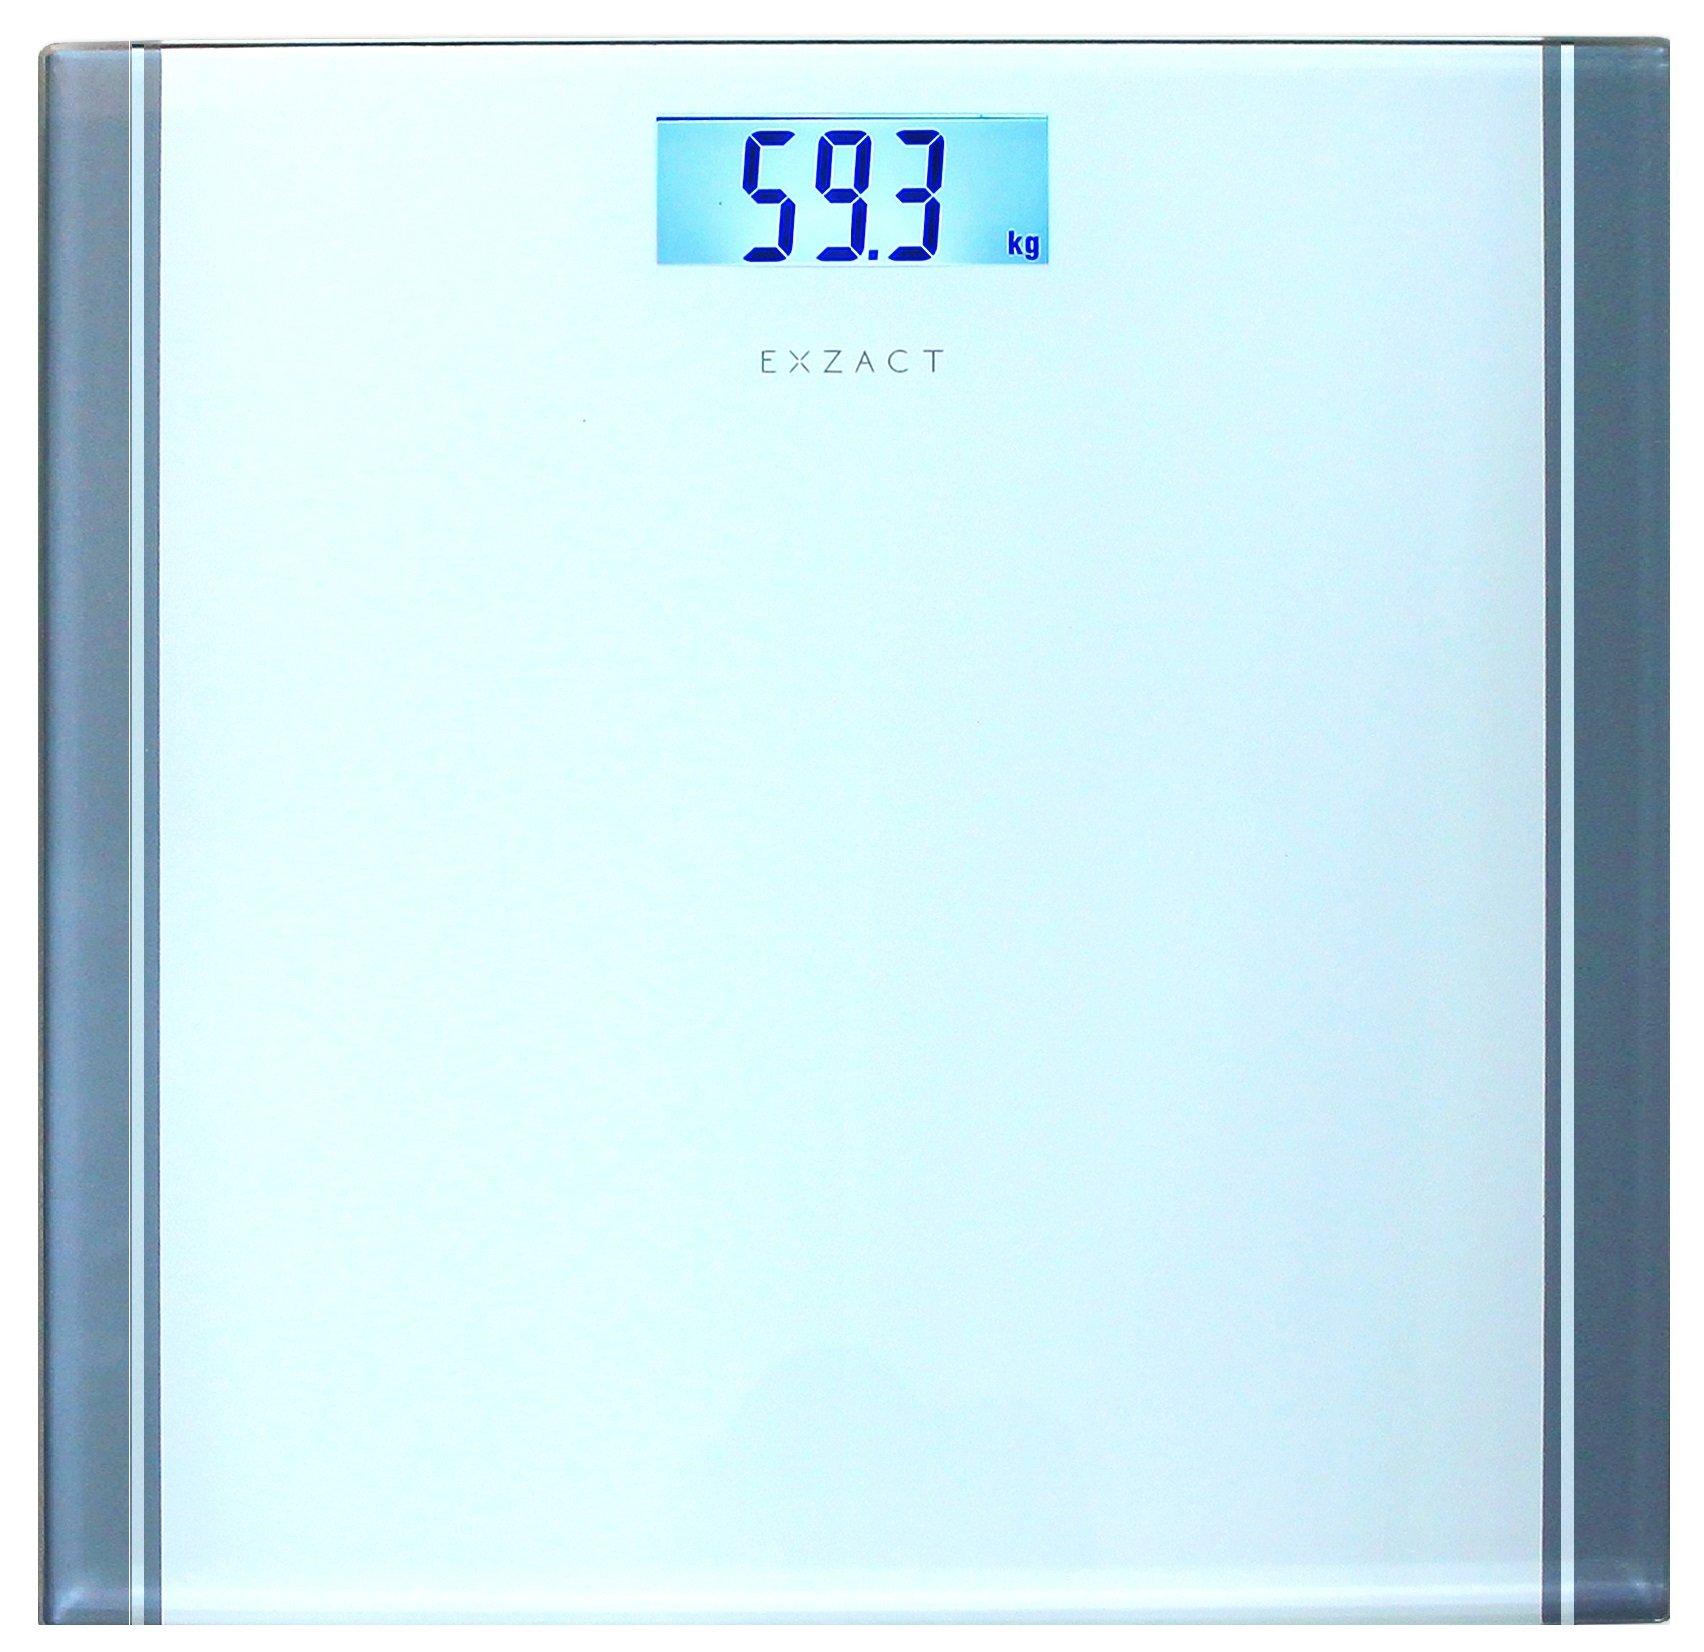 71wZrJac1FL - Exzact - Báscula Corporal Electrónica/Báscula de Baño Digital/Escala Personal -Capacidad Grande 180kg / 400lb / 28st